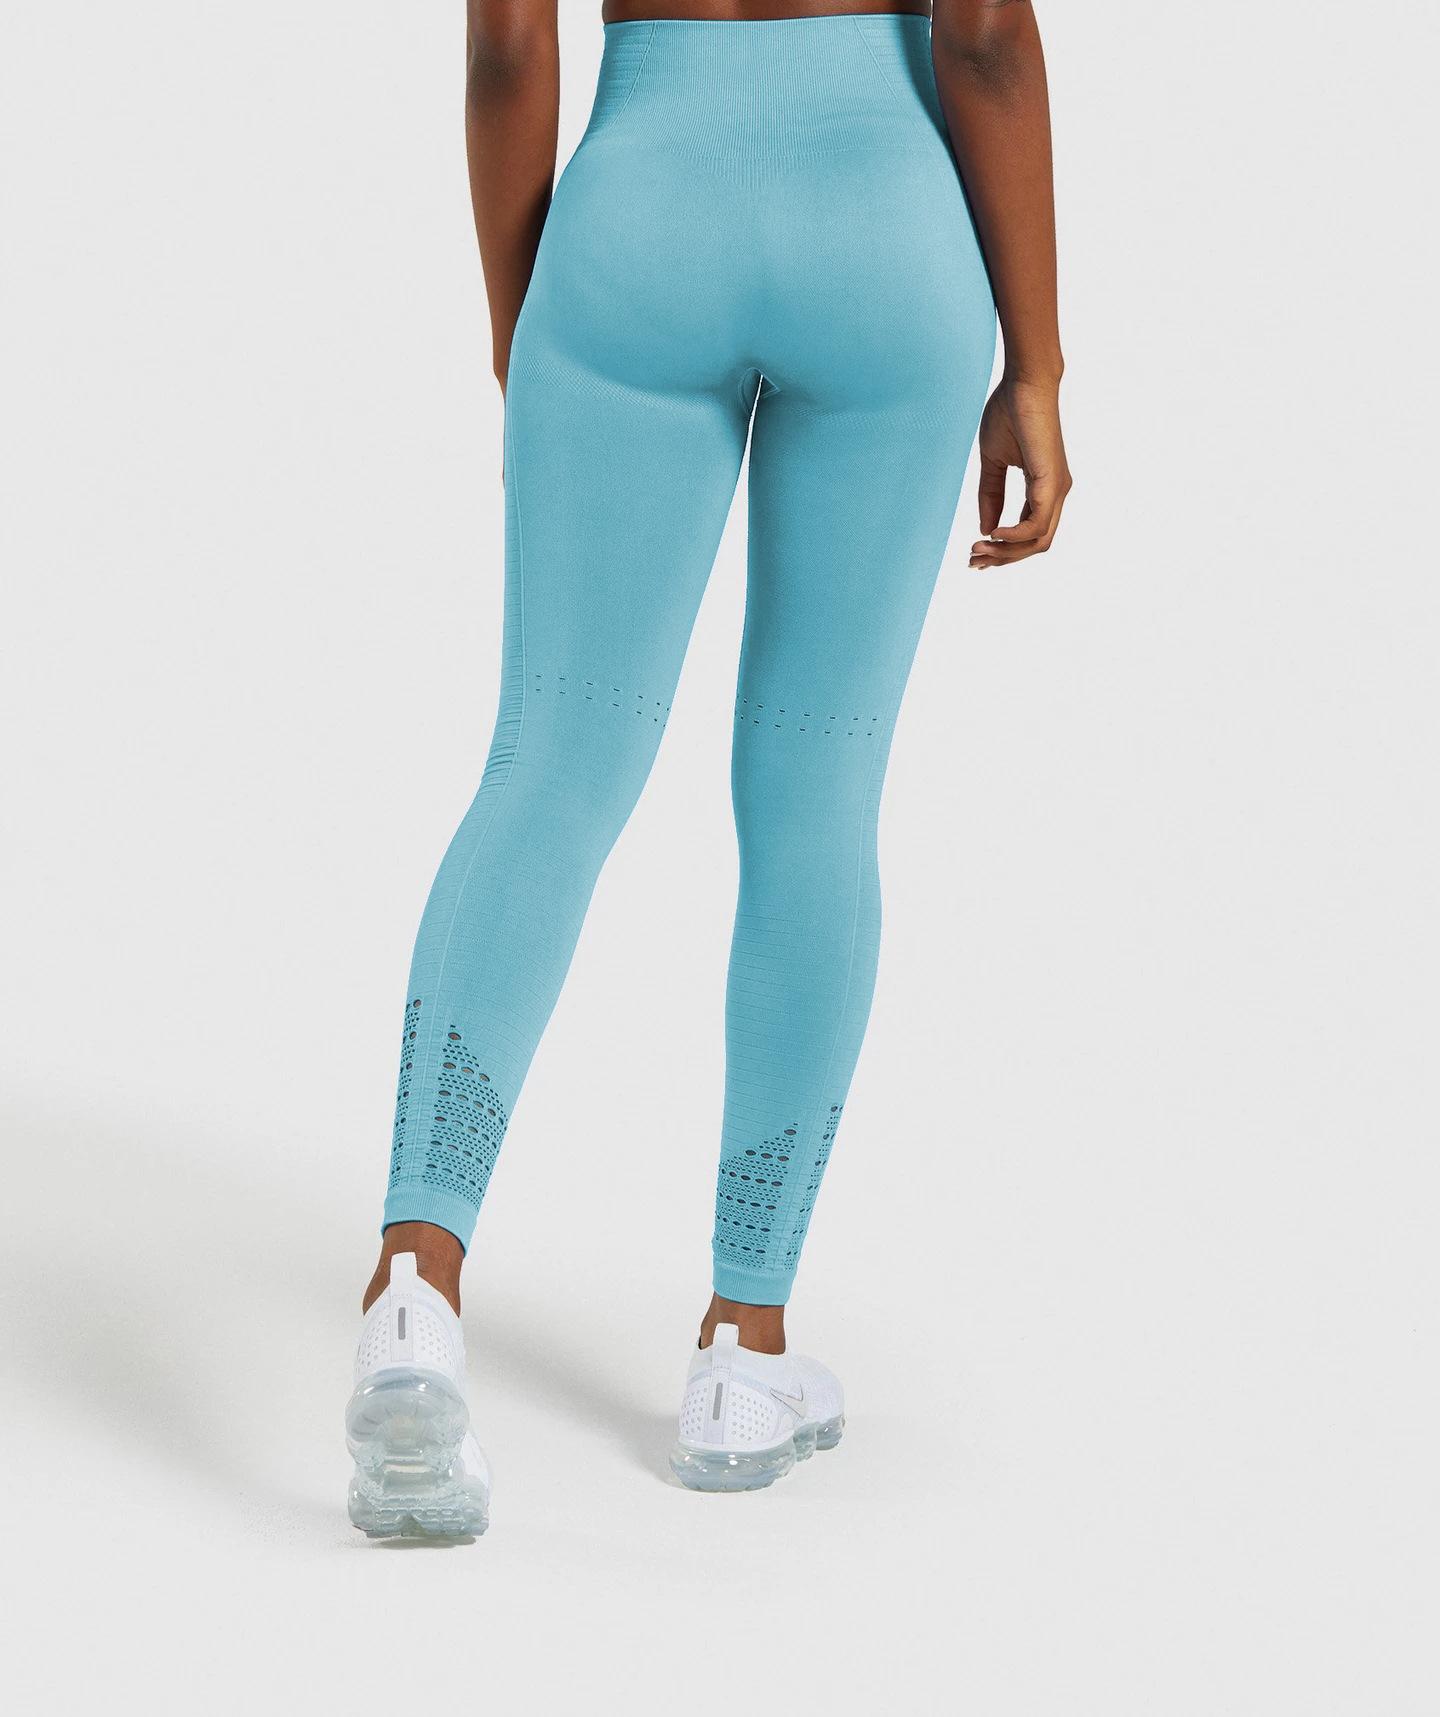 hollow high waist tight-fitting hip-lifting seamless sports pants  NSLX9719